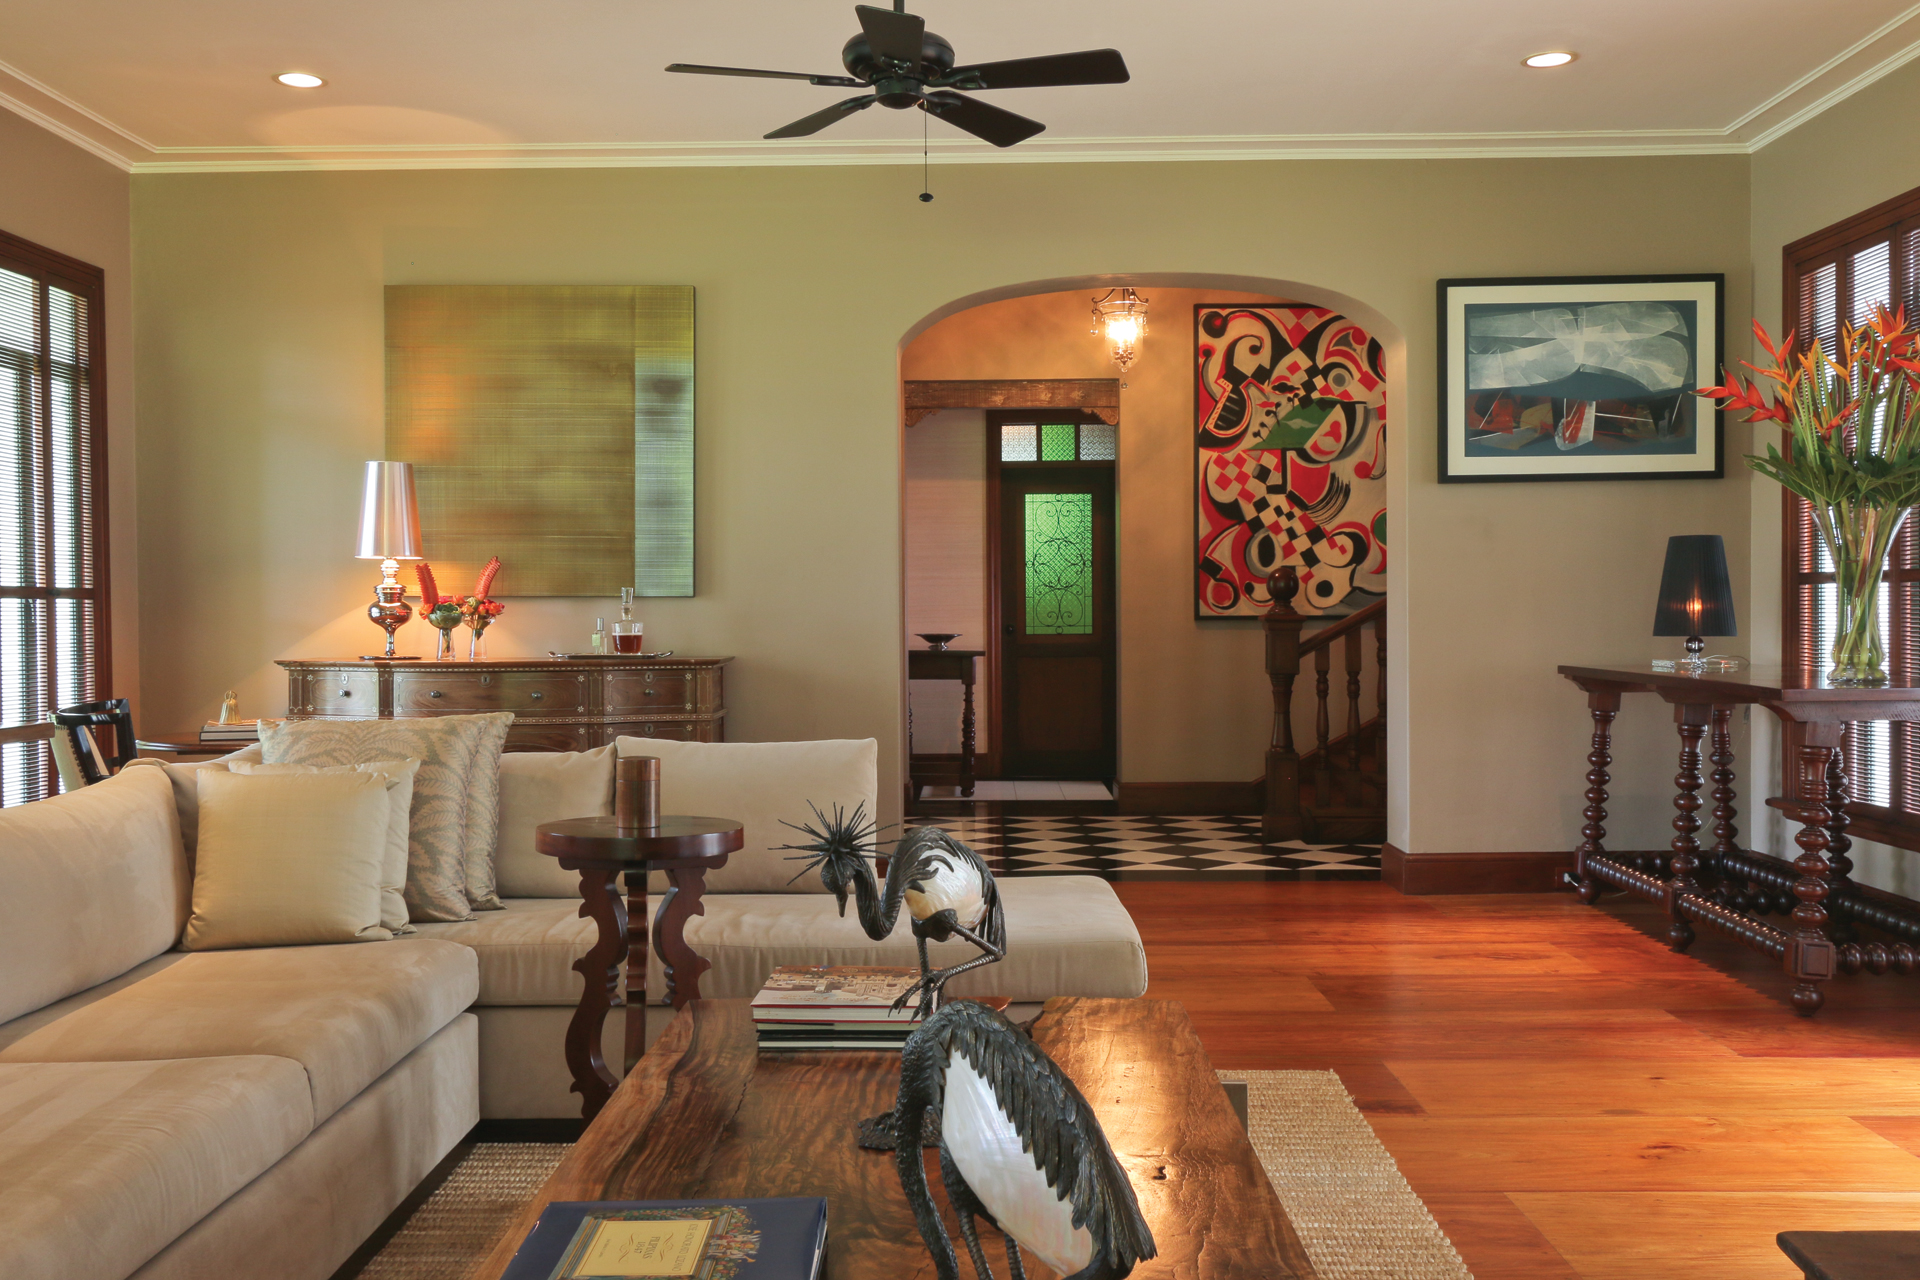 Philippine Home Interior Design | Flisol Home